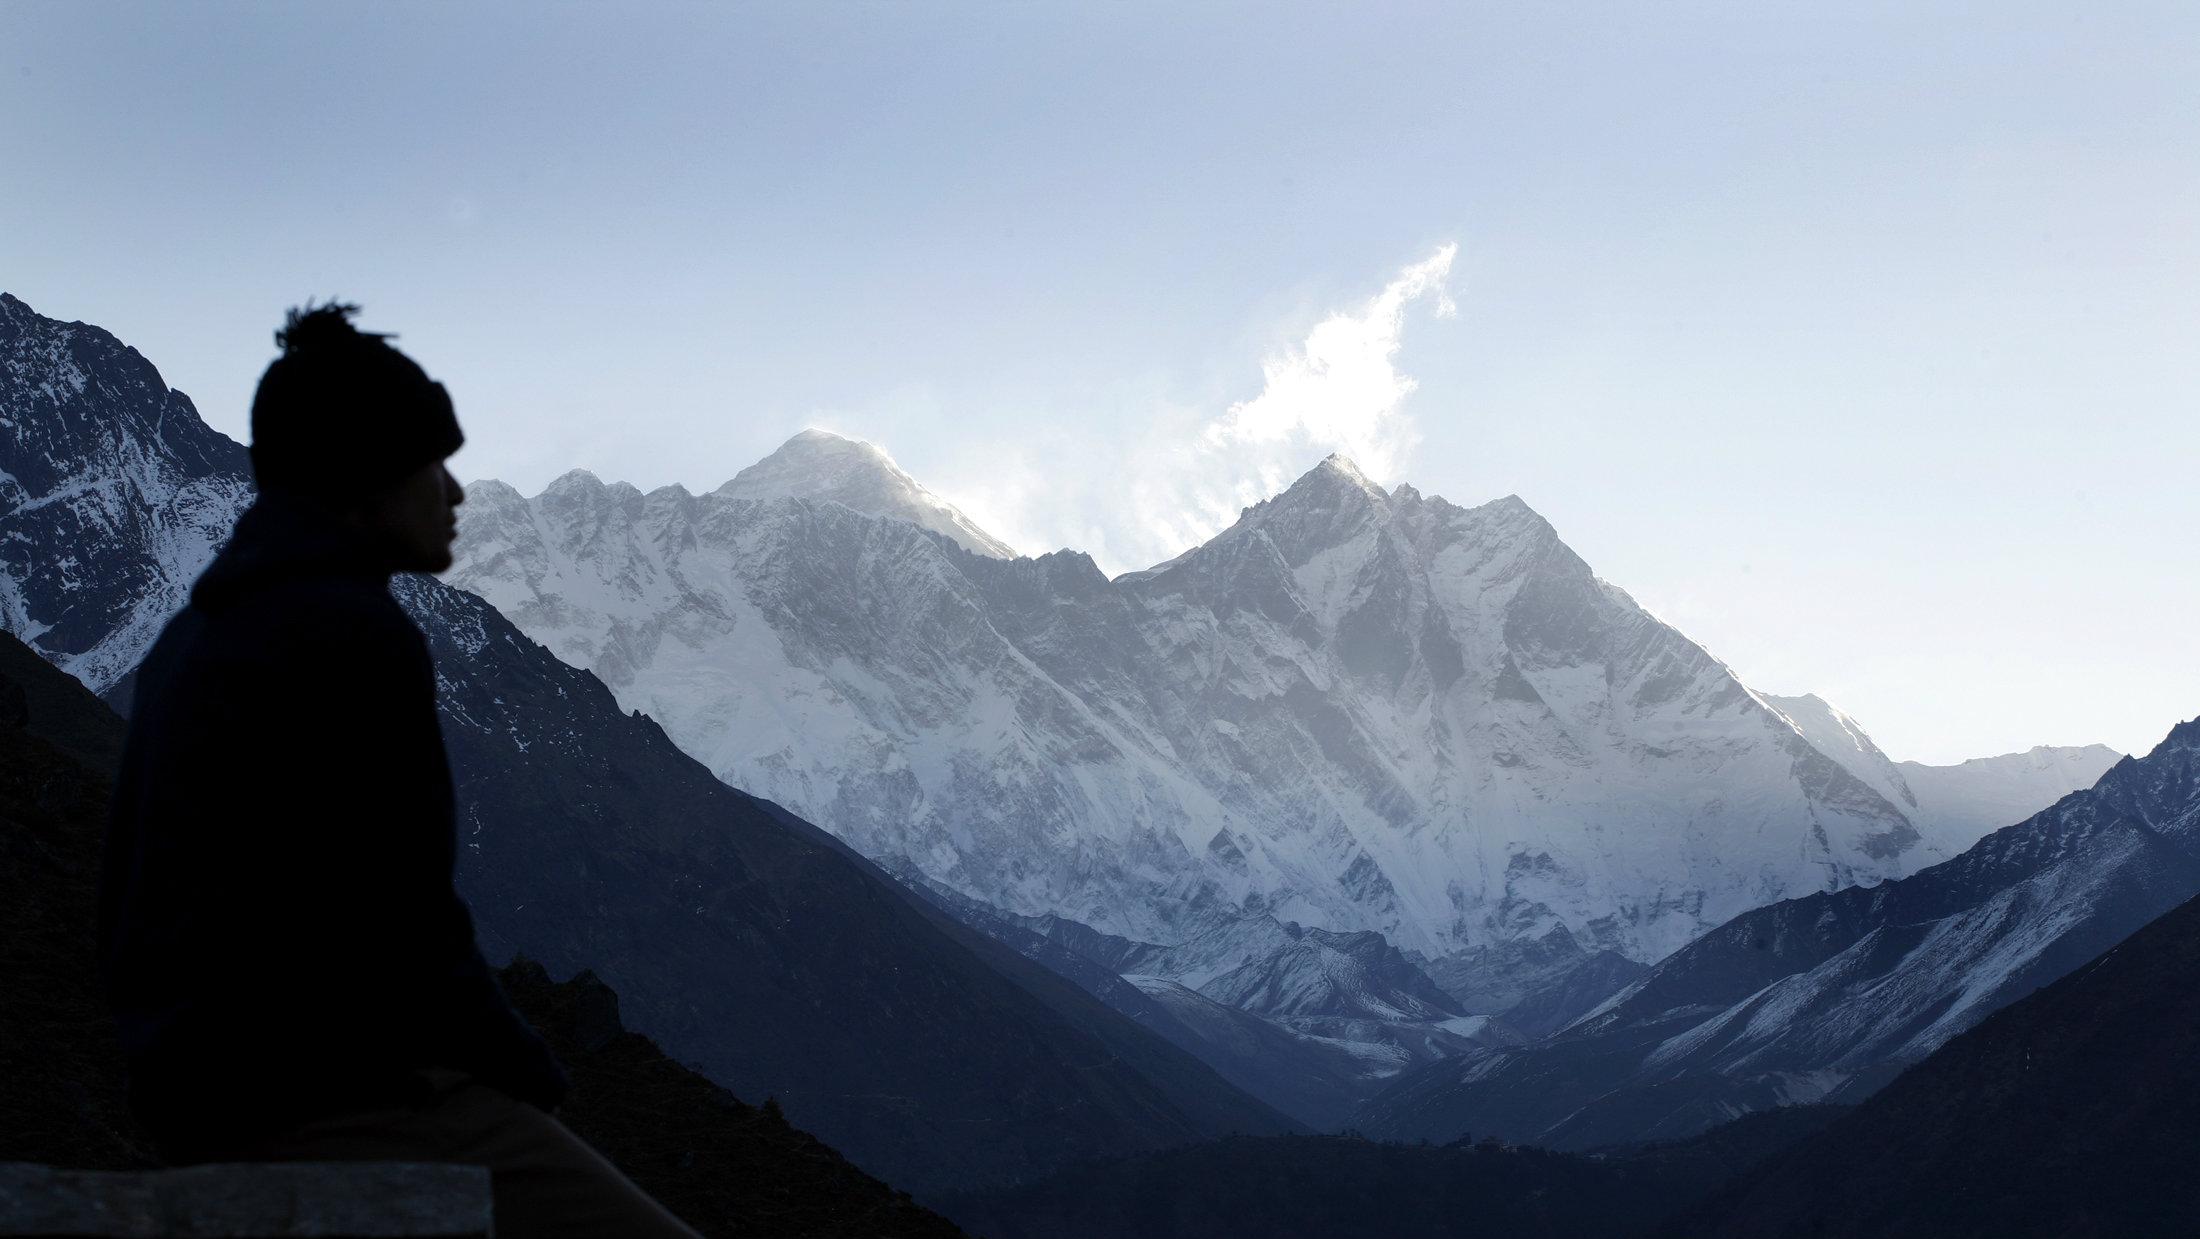 Tourist gazing at Everest